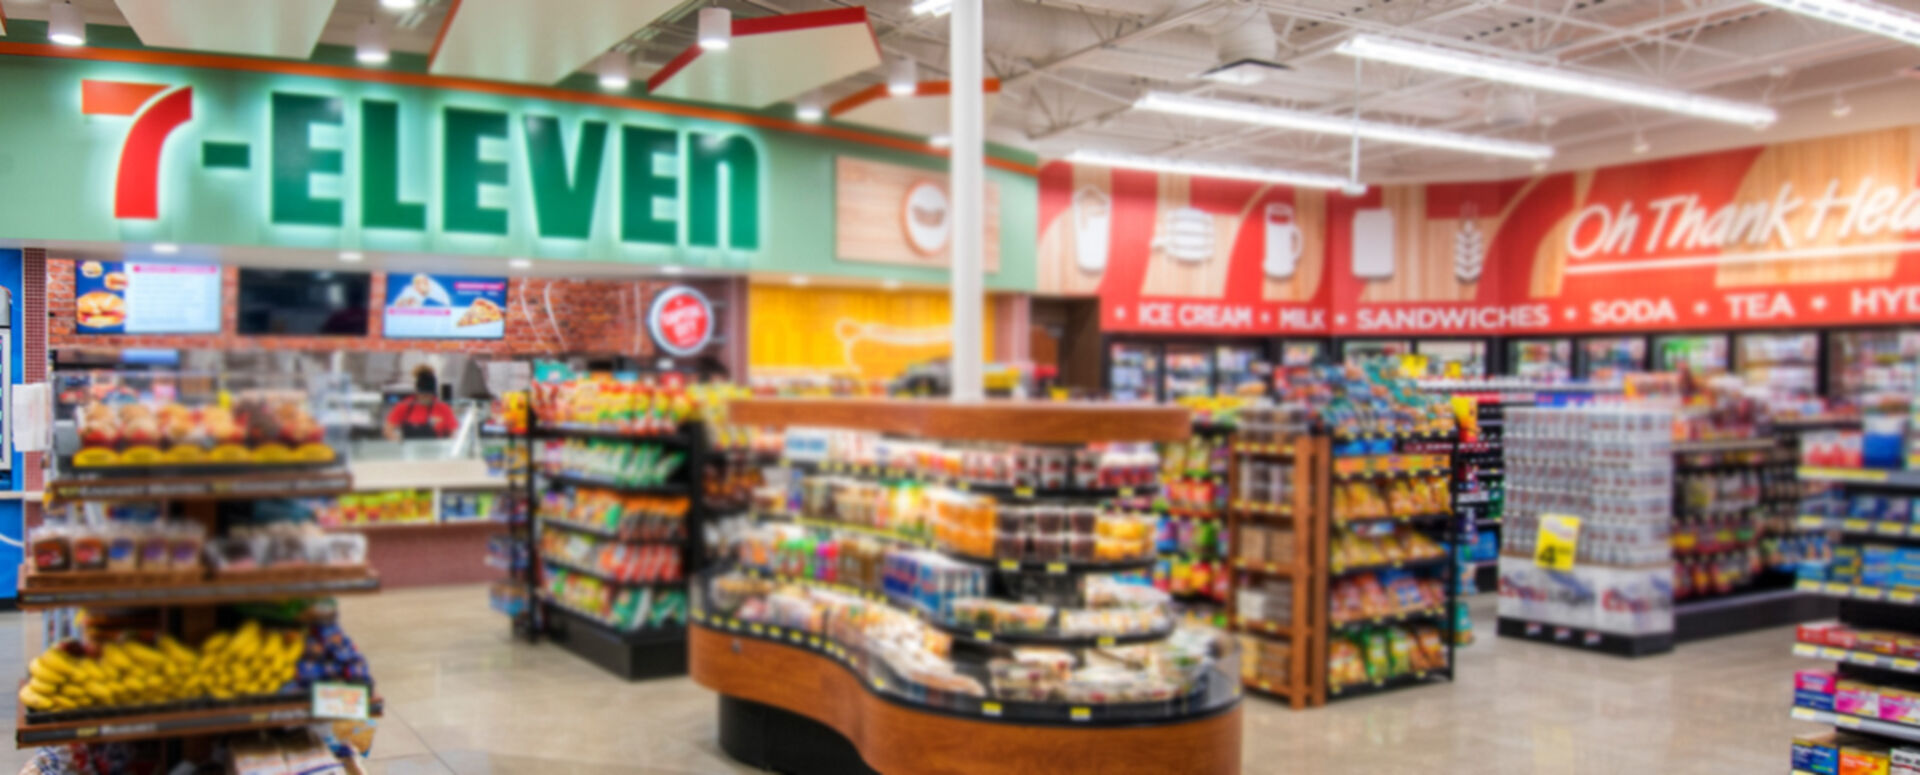 4 inconvenient facts supermarkets should learn about convenience stores